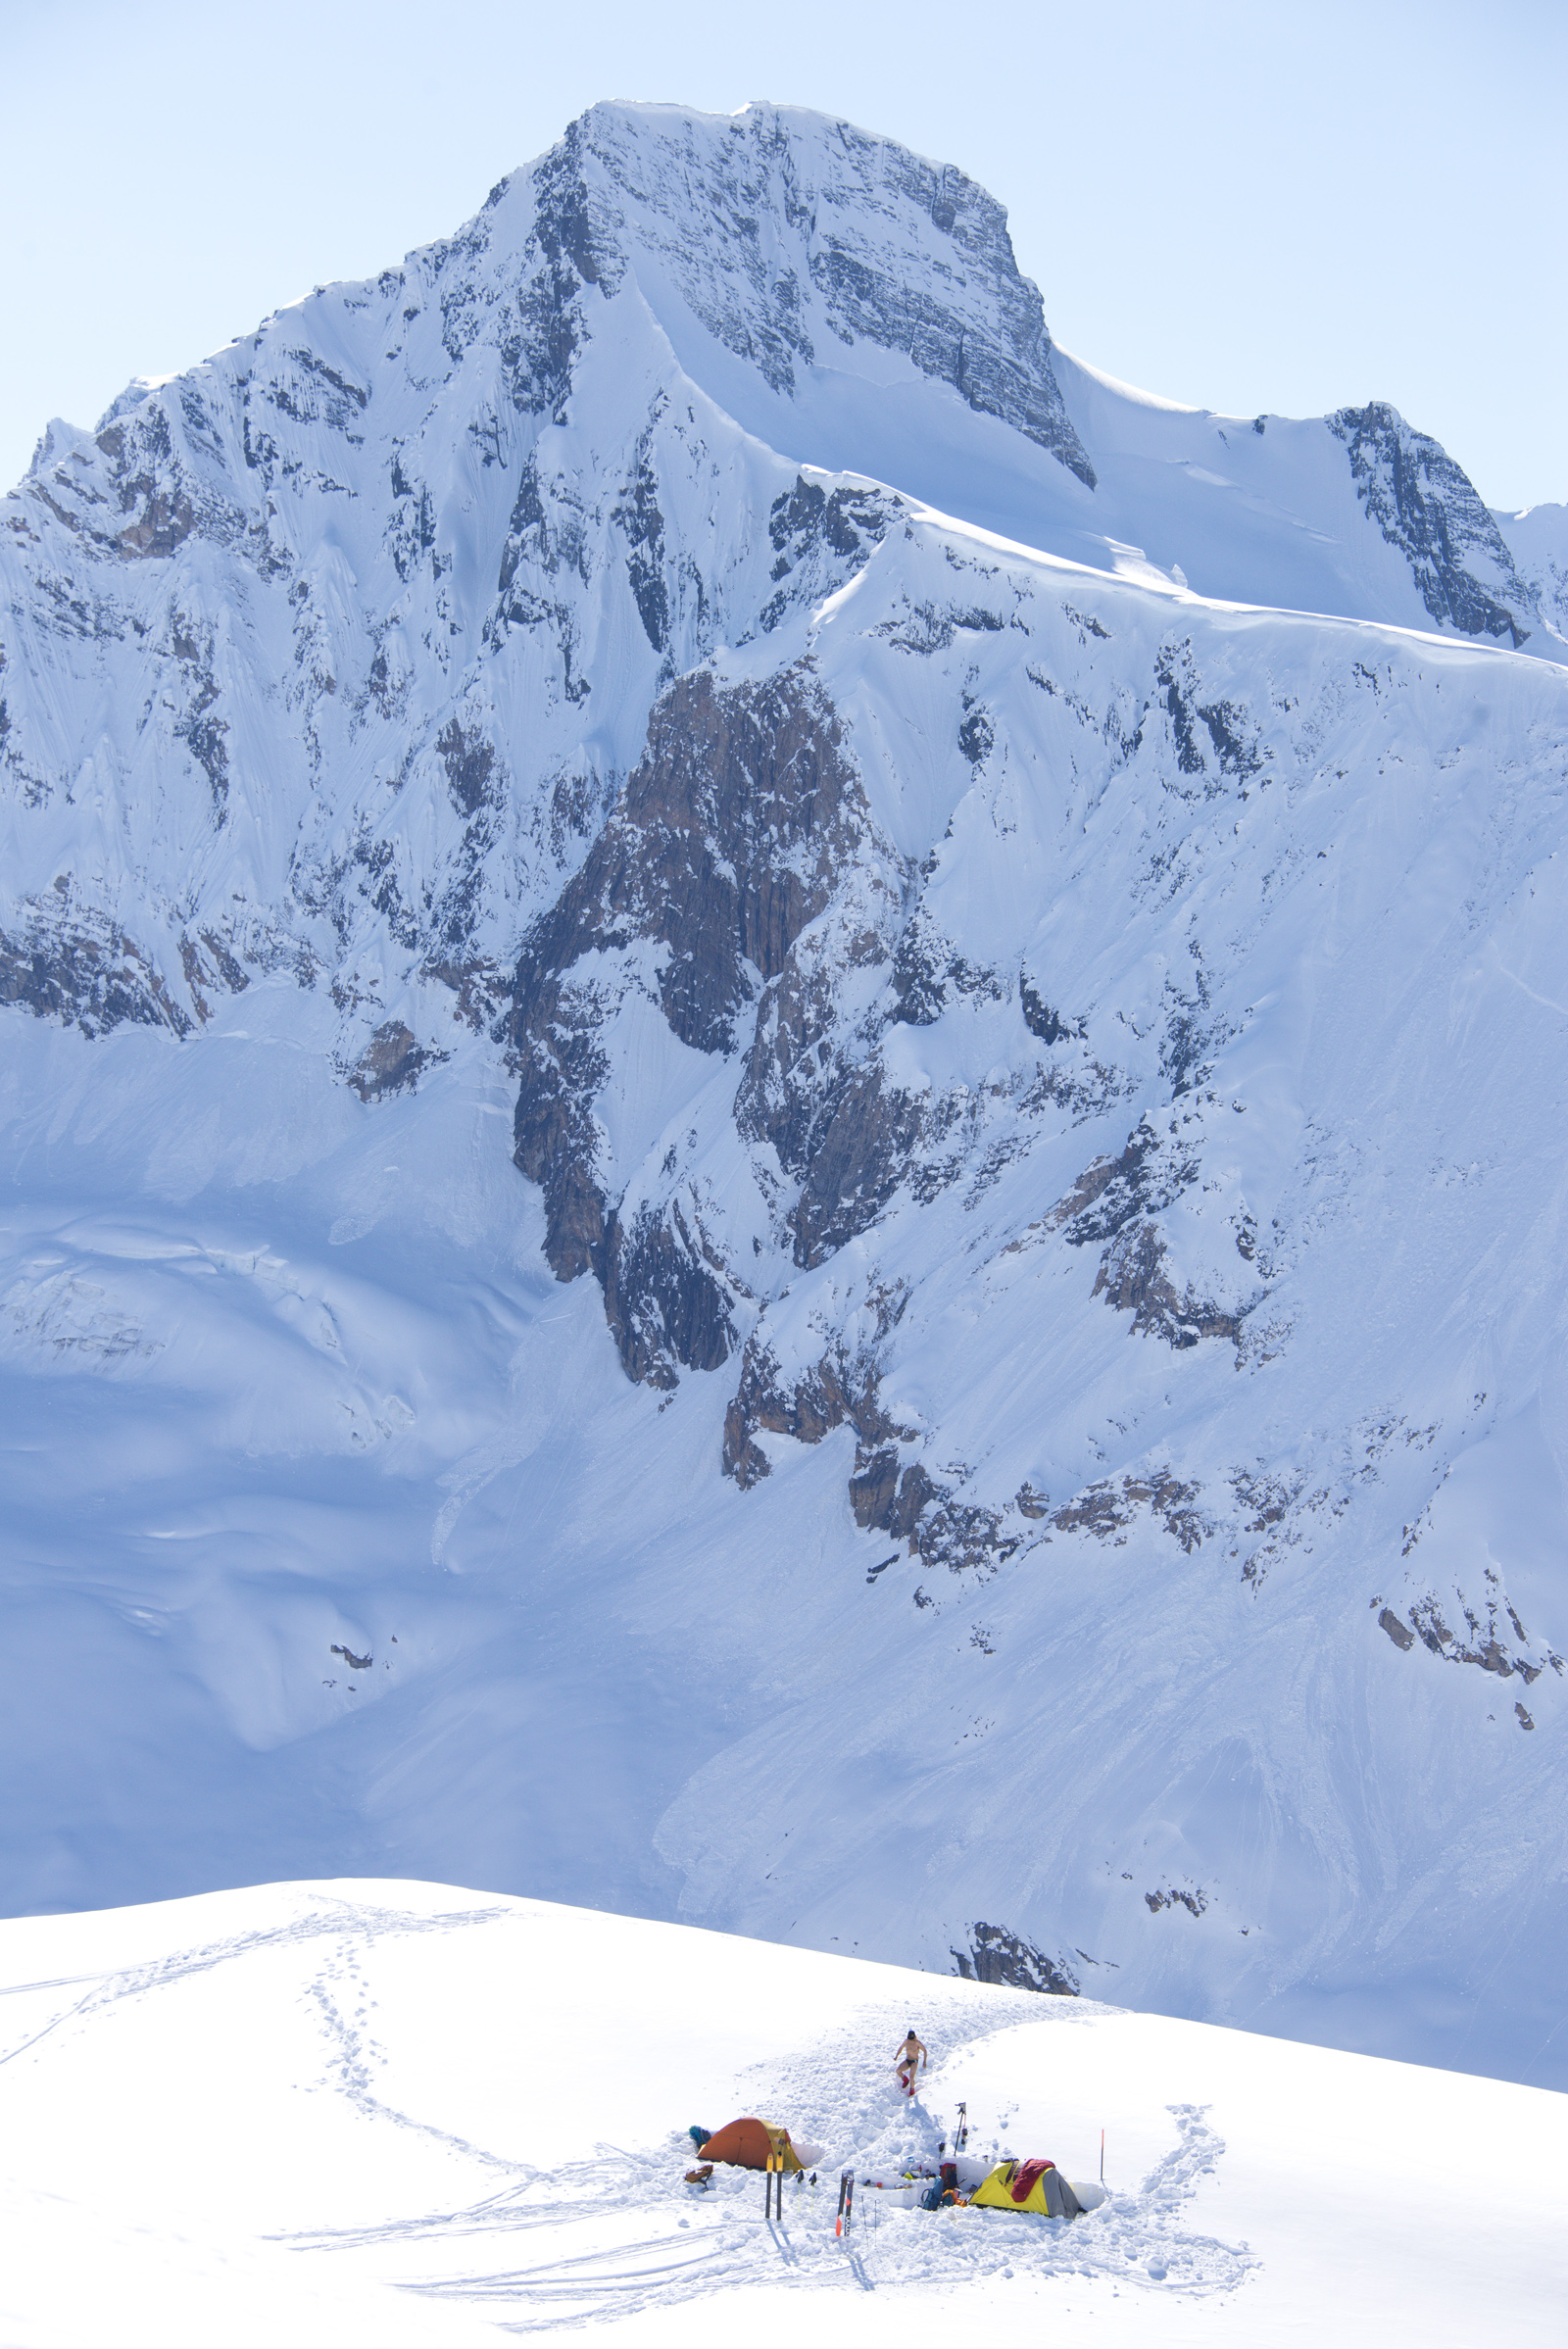 "Farnham Creek ""ski camp"" April 28-30, '14; Brett Eyben getting some rays; The Cleaver peak behind and part of Farnham Glacier visible to left"